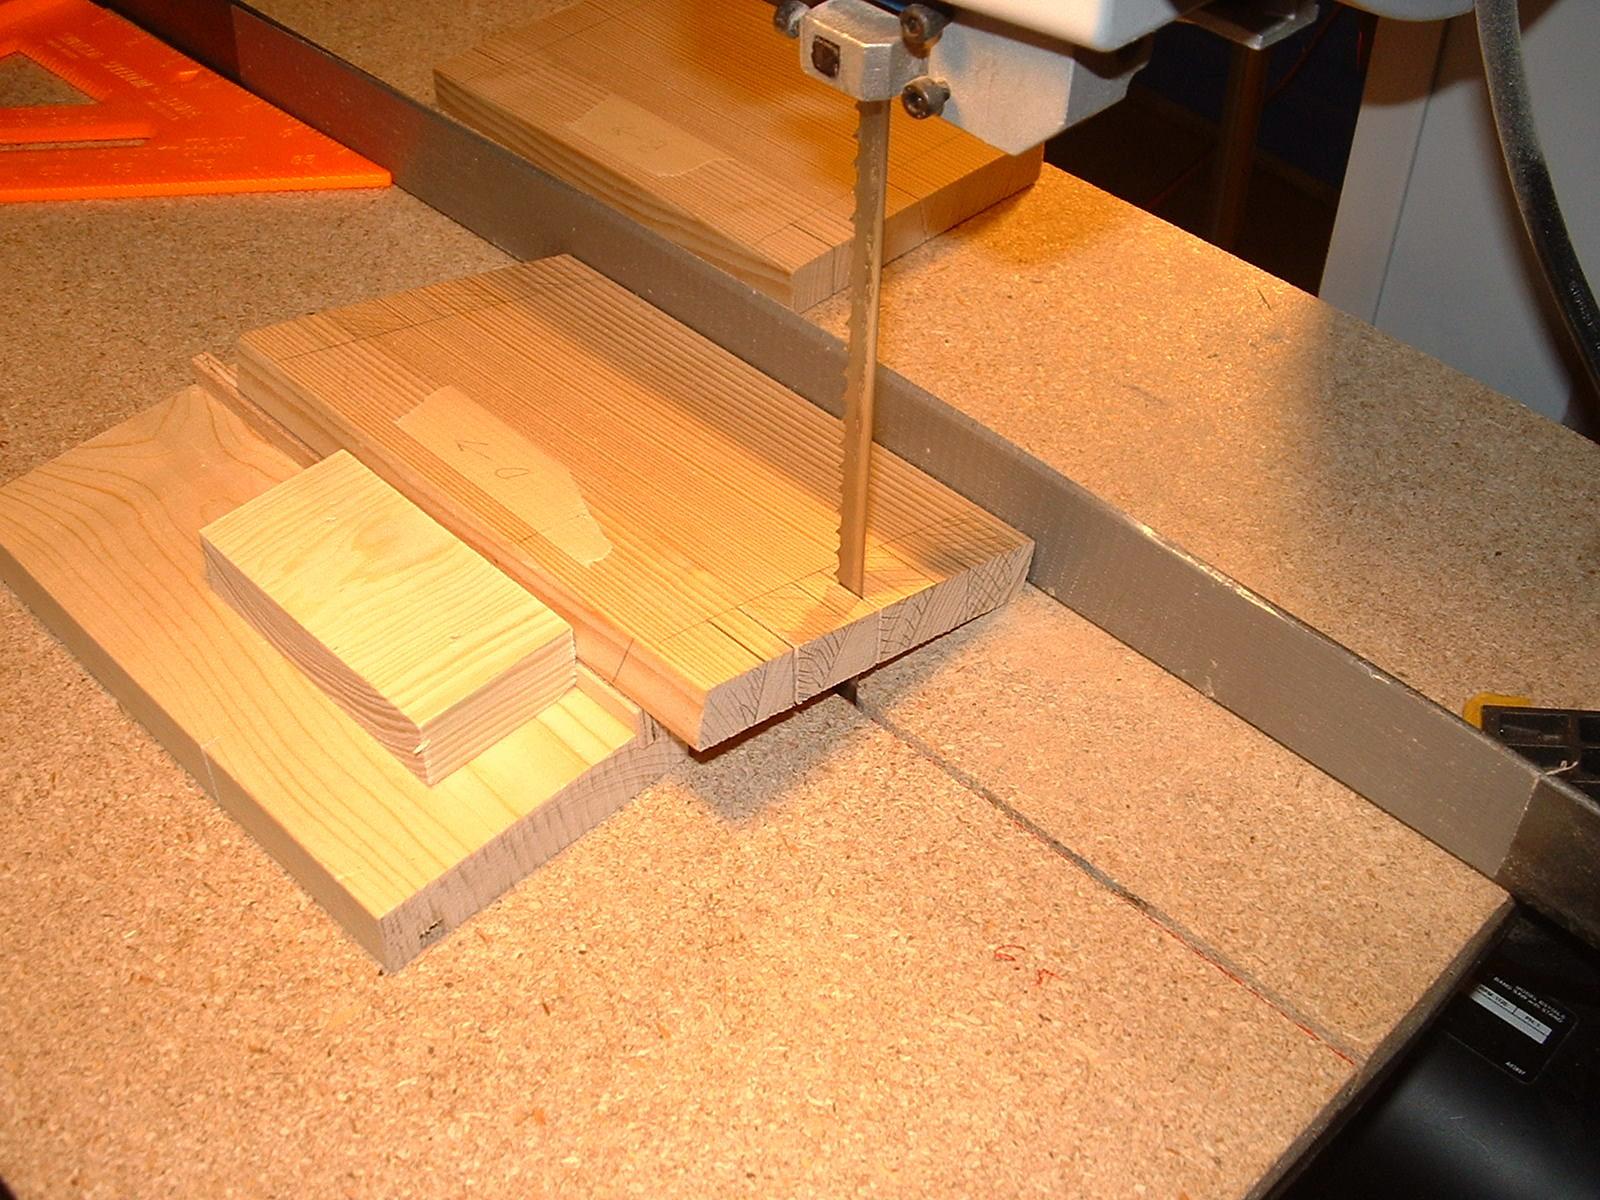 Making A Dovetail Box